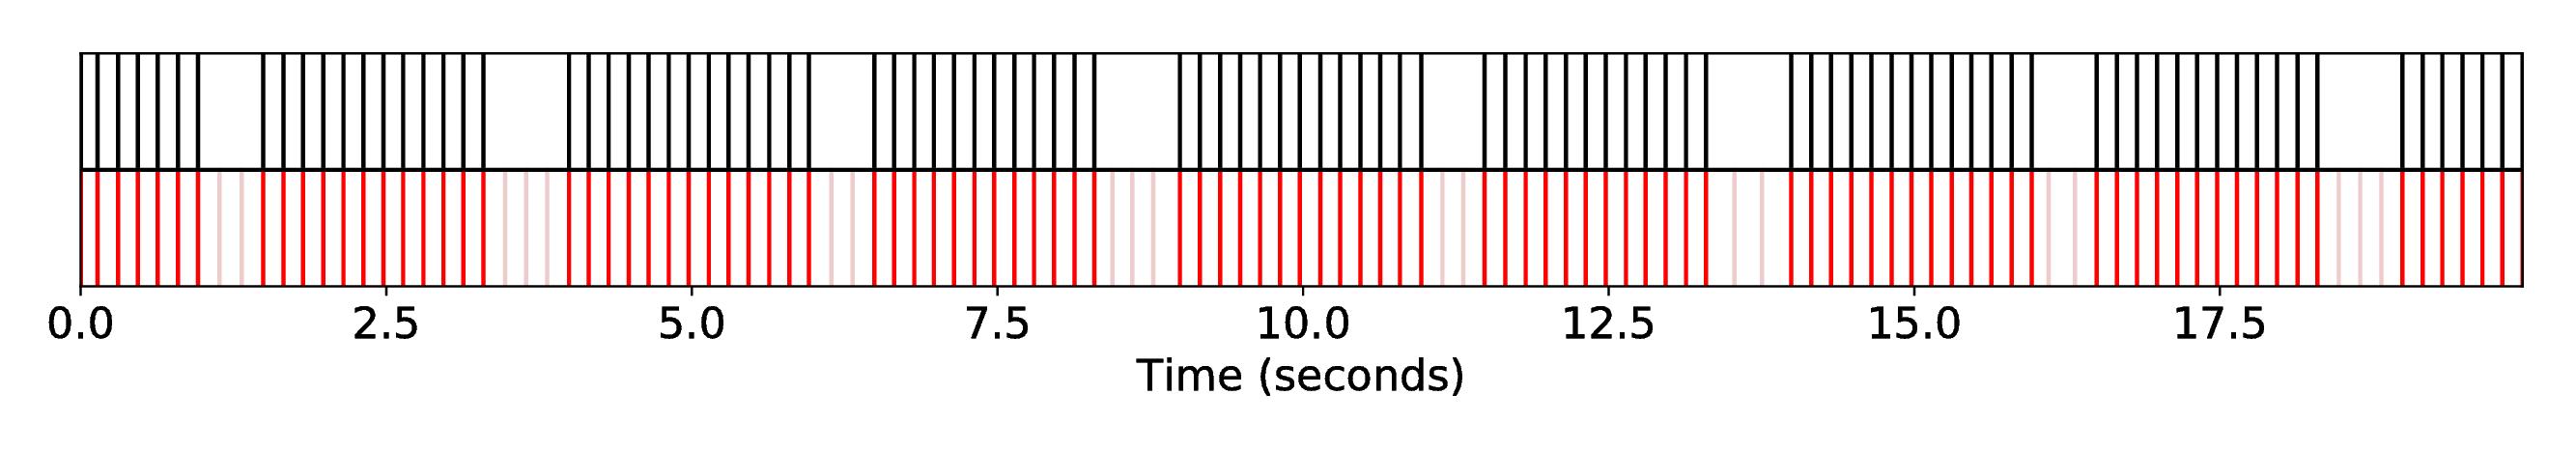 DP1_INT1_R-MRI-24__S-Silence__SequenceAlignment